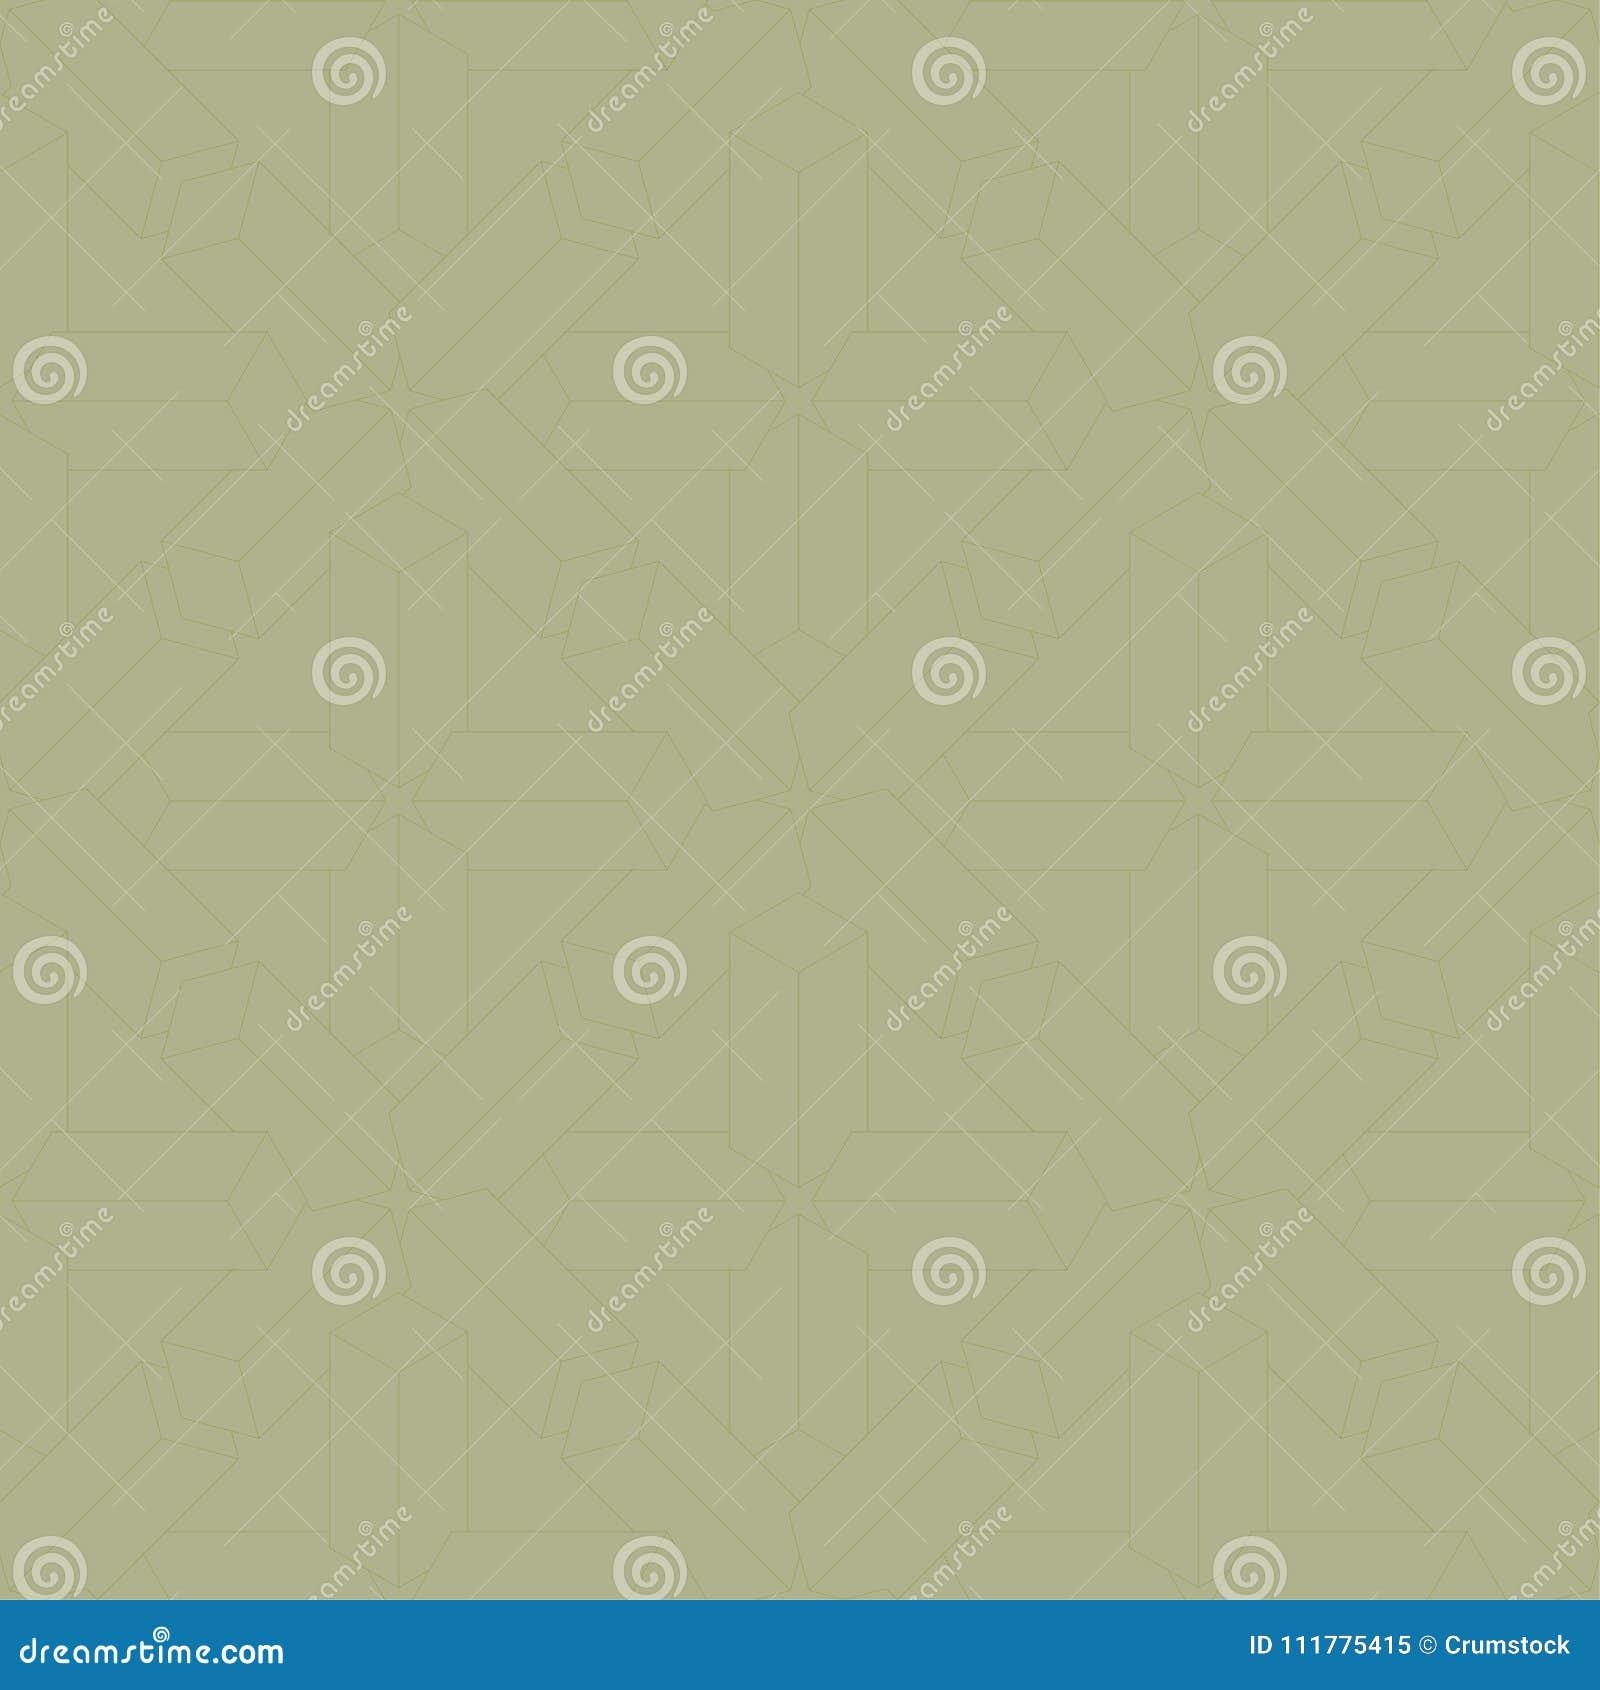 Geometric ornament. Olive green seamless pattern